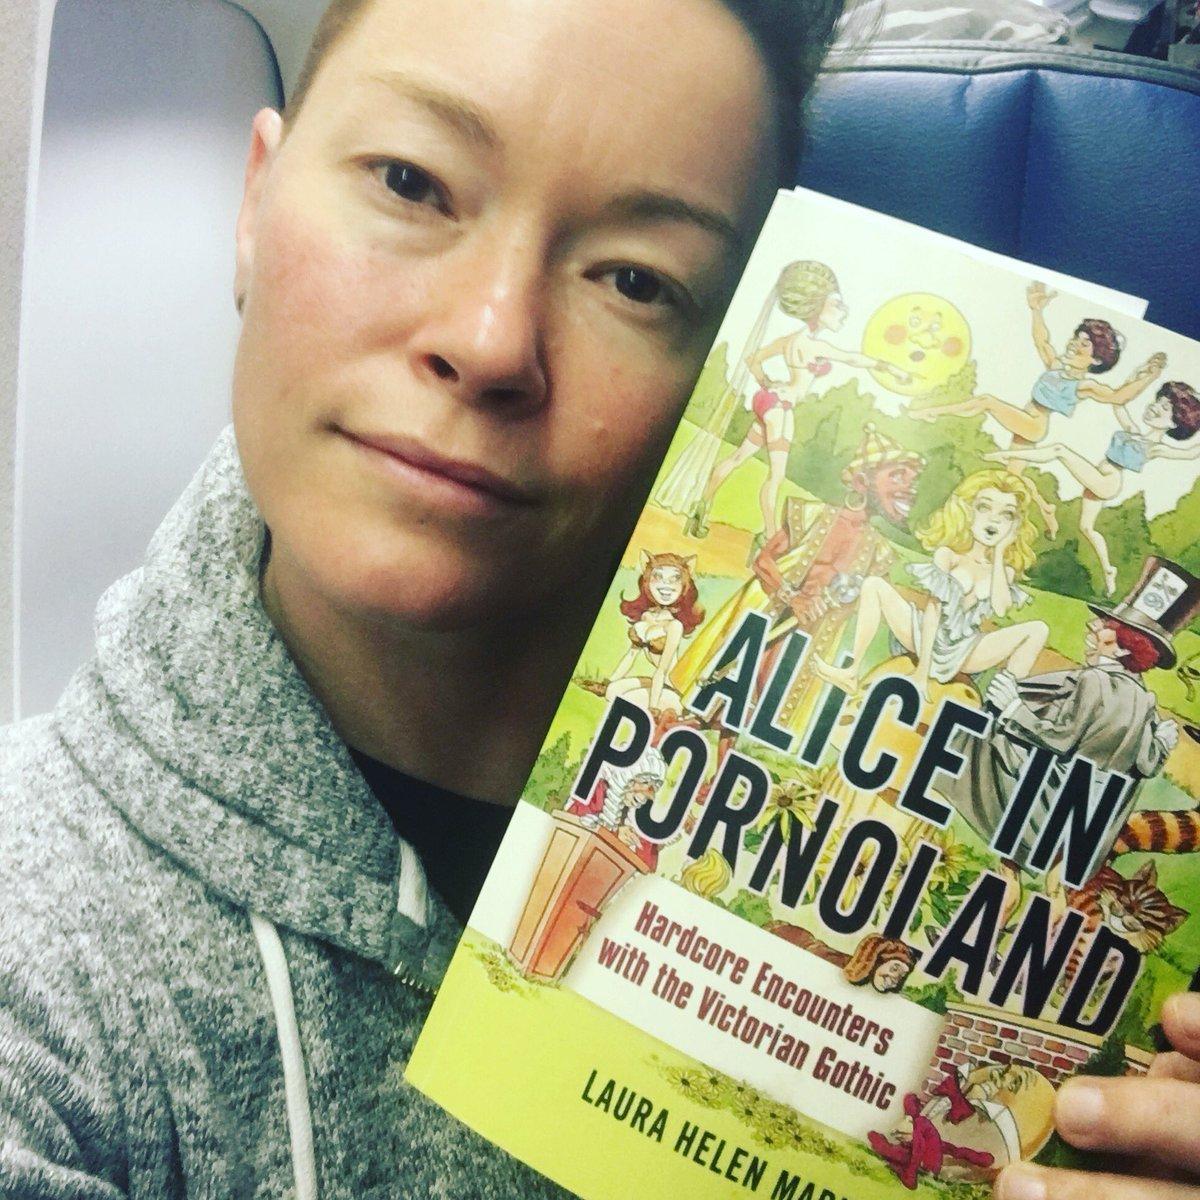 Flying to Denison University with an ARC of 's Alice in Pornoland! #pornstudies #booksonaplane